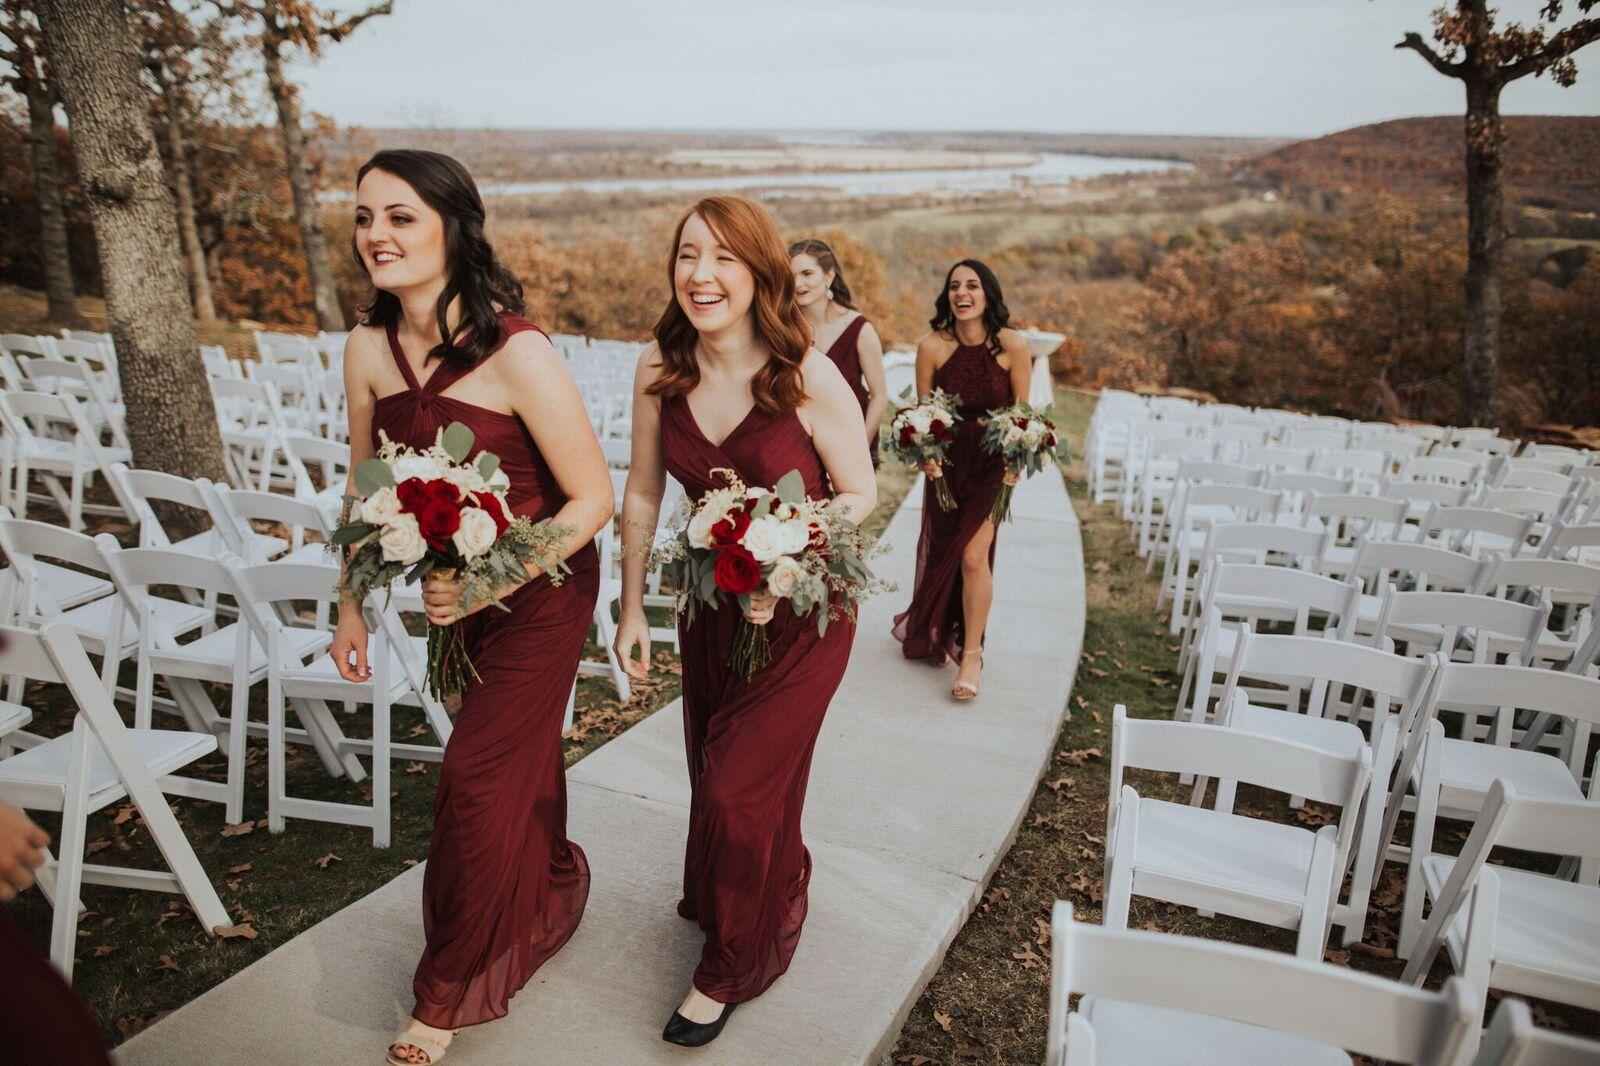 Tulsa Wedding Venue White Barn 19a.jpg